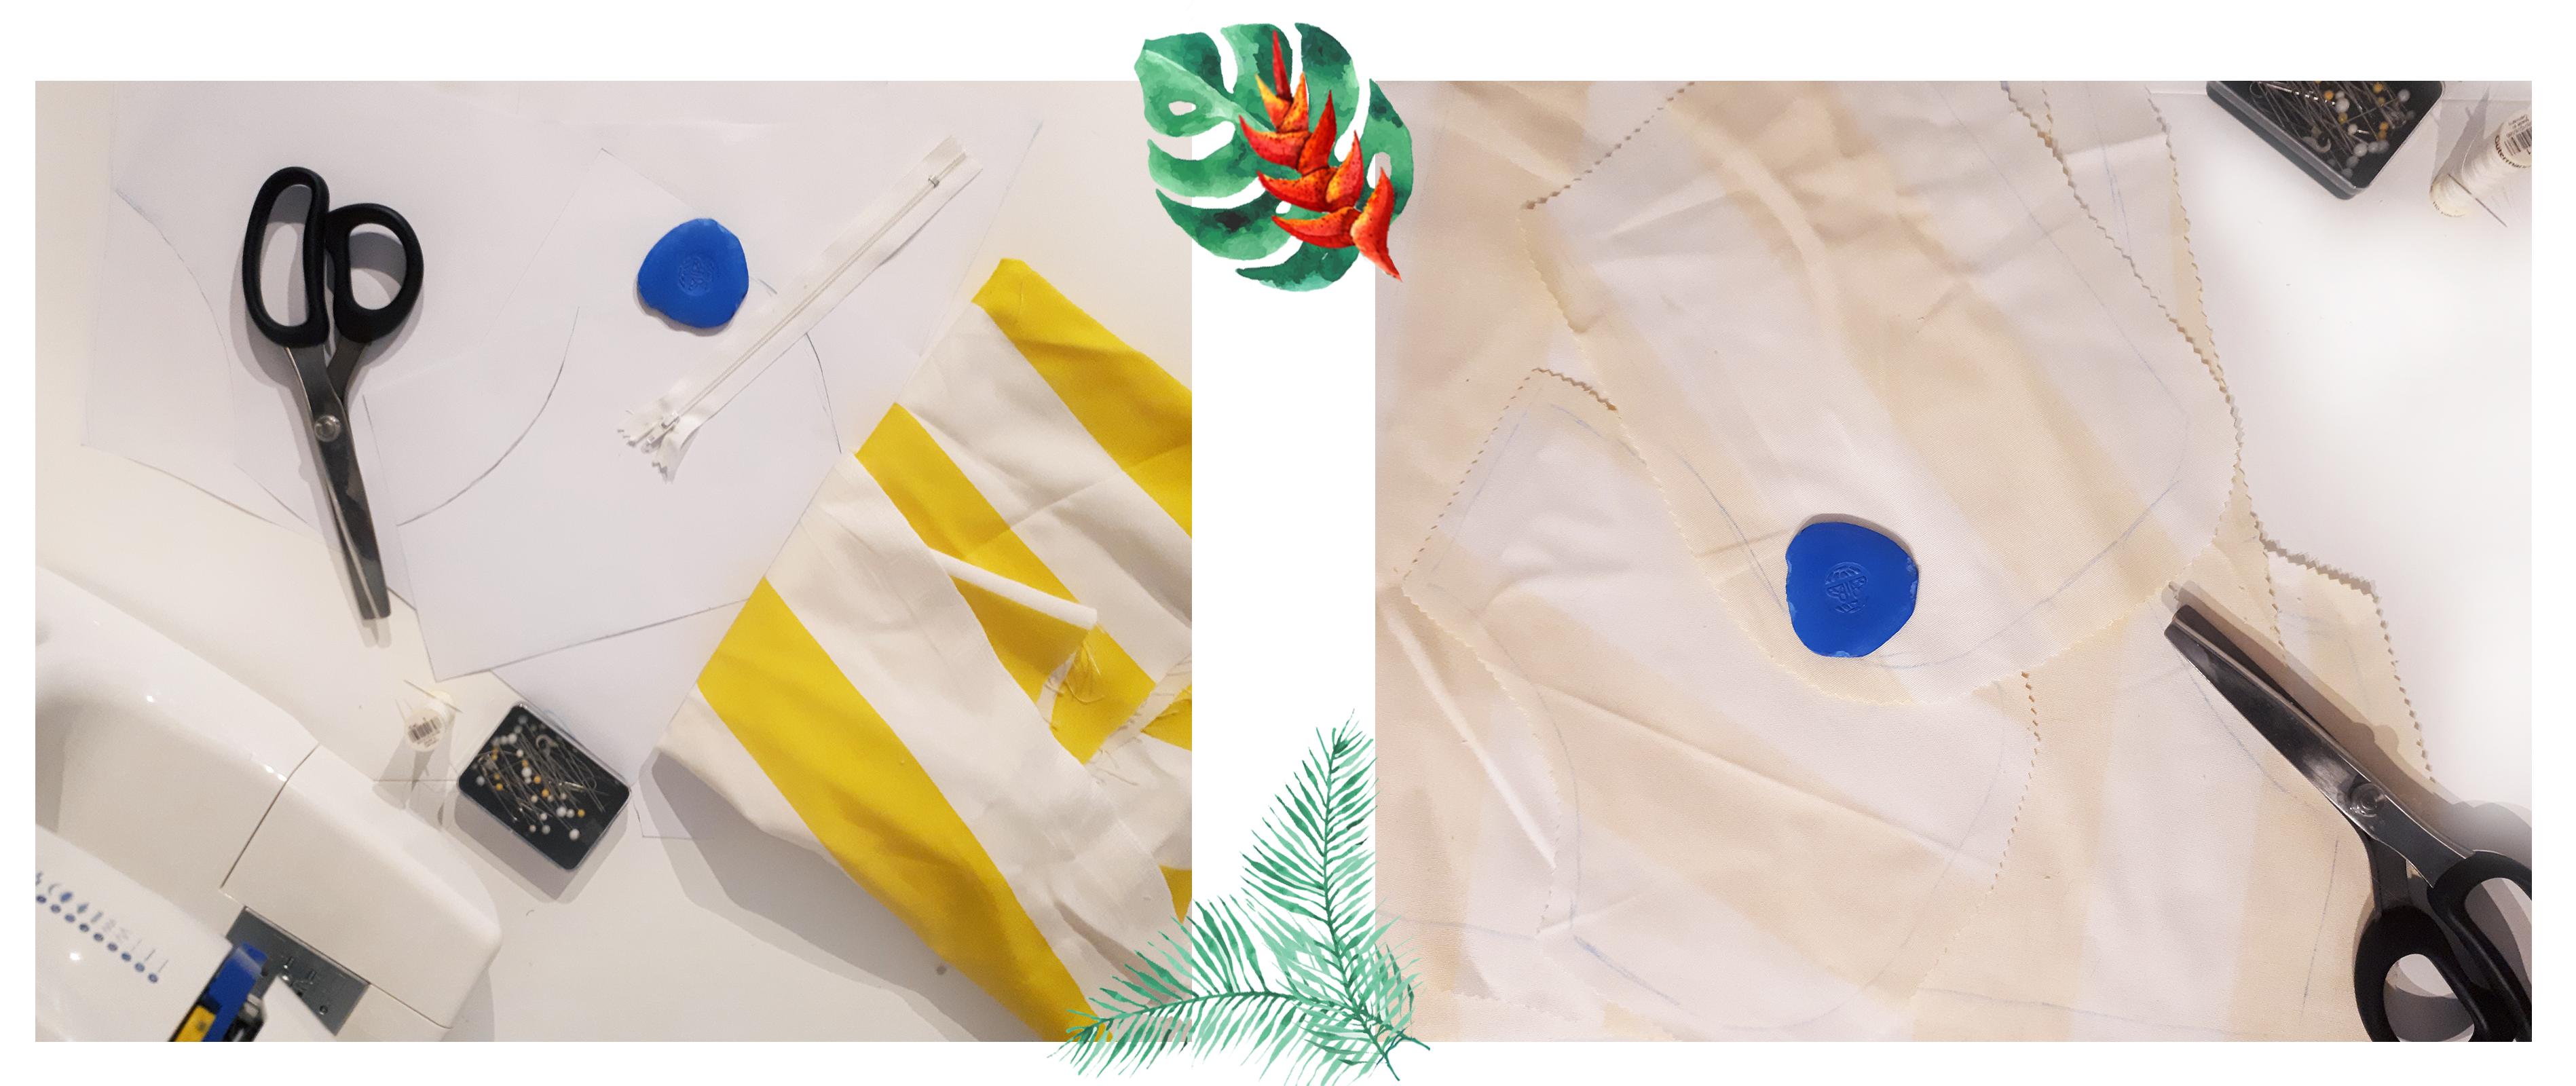 DIY-short-taille-haute-patron-etape-1-2-Cactus-and-style